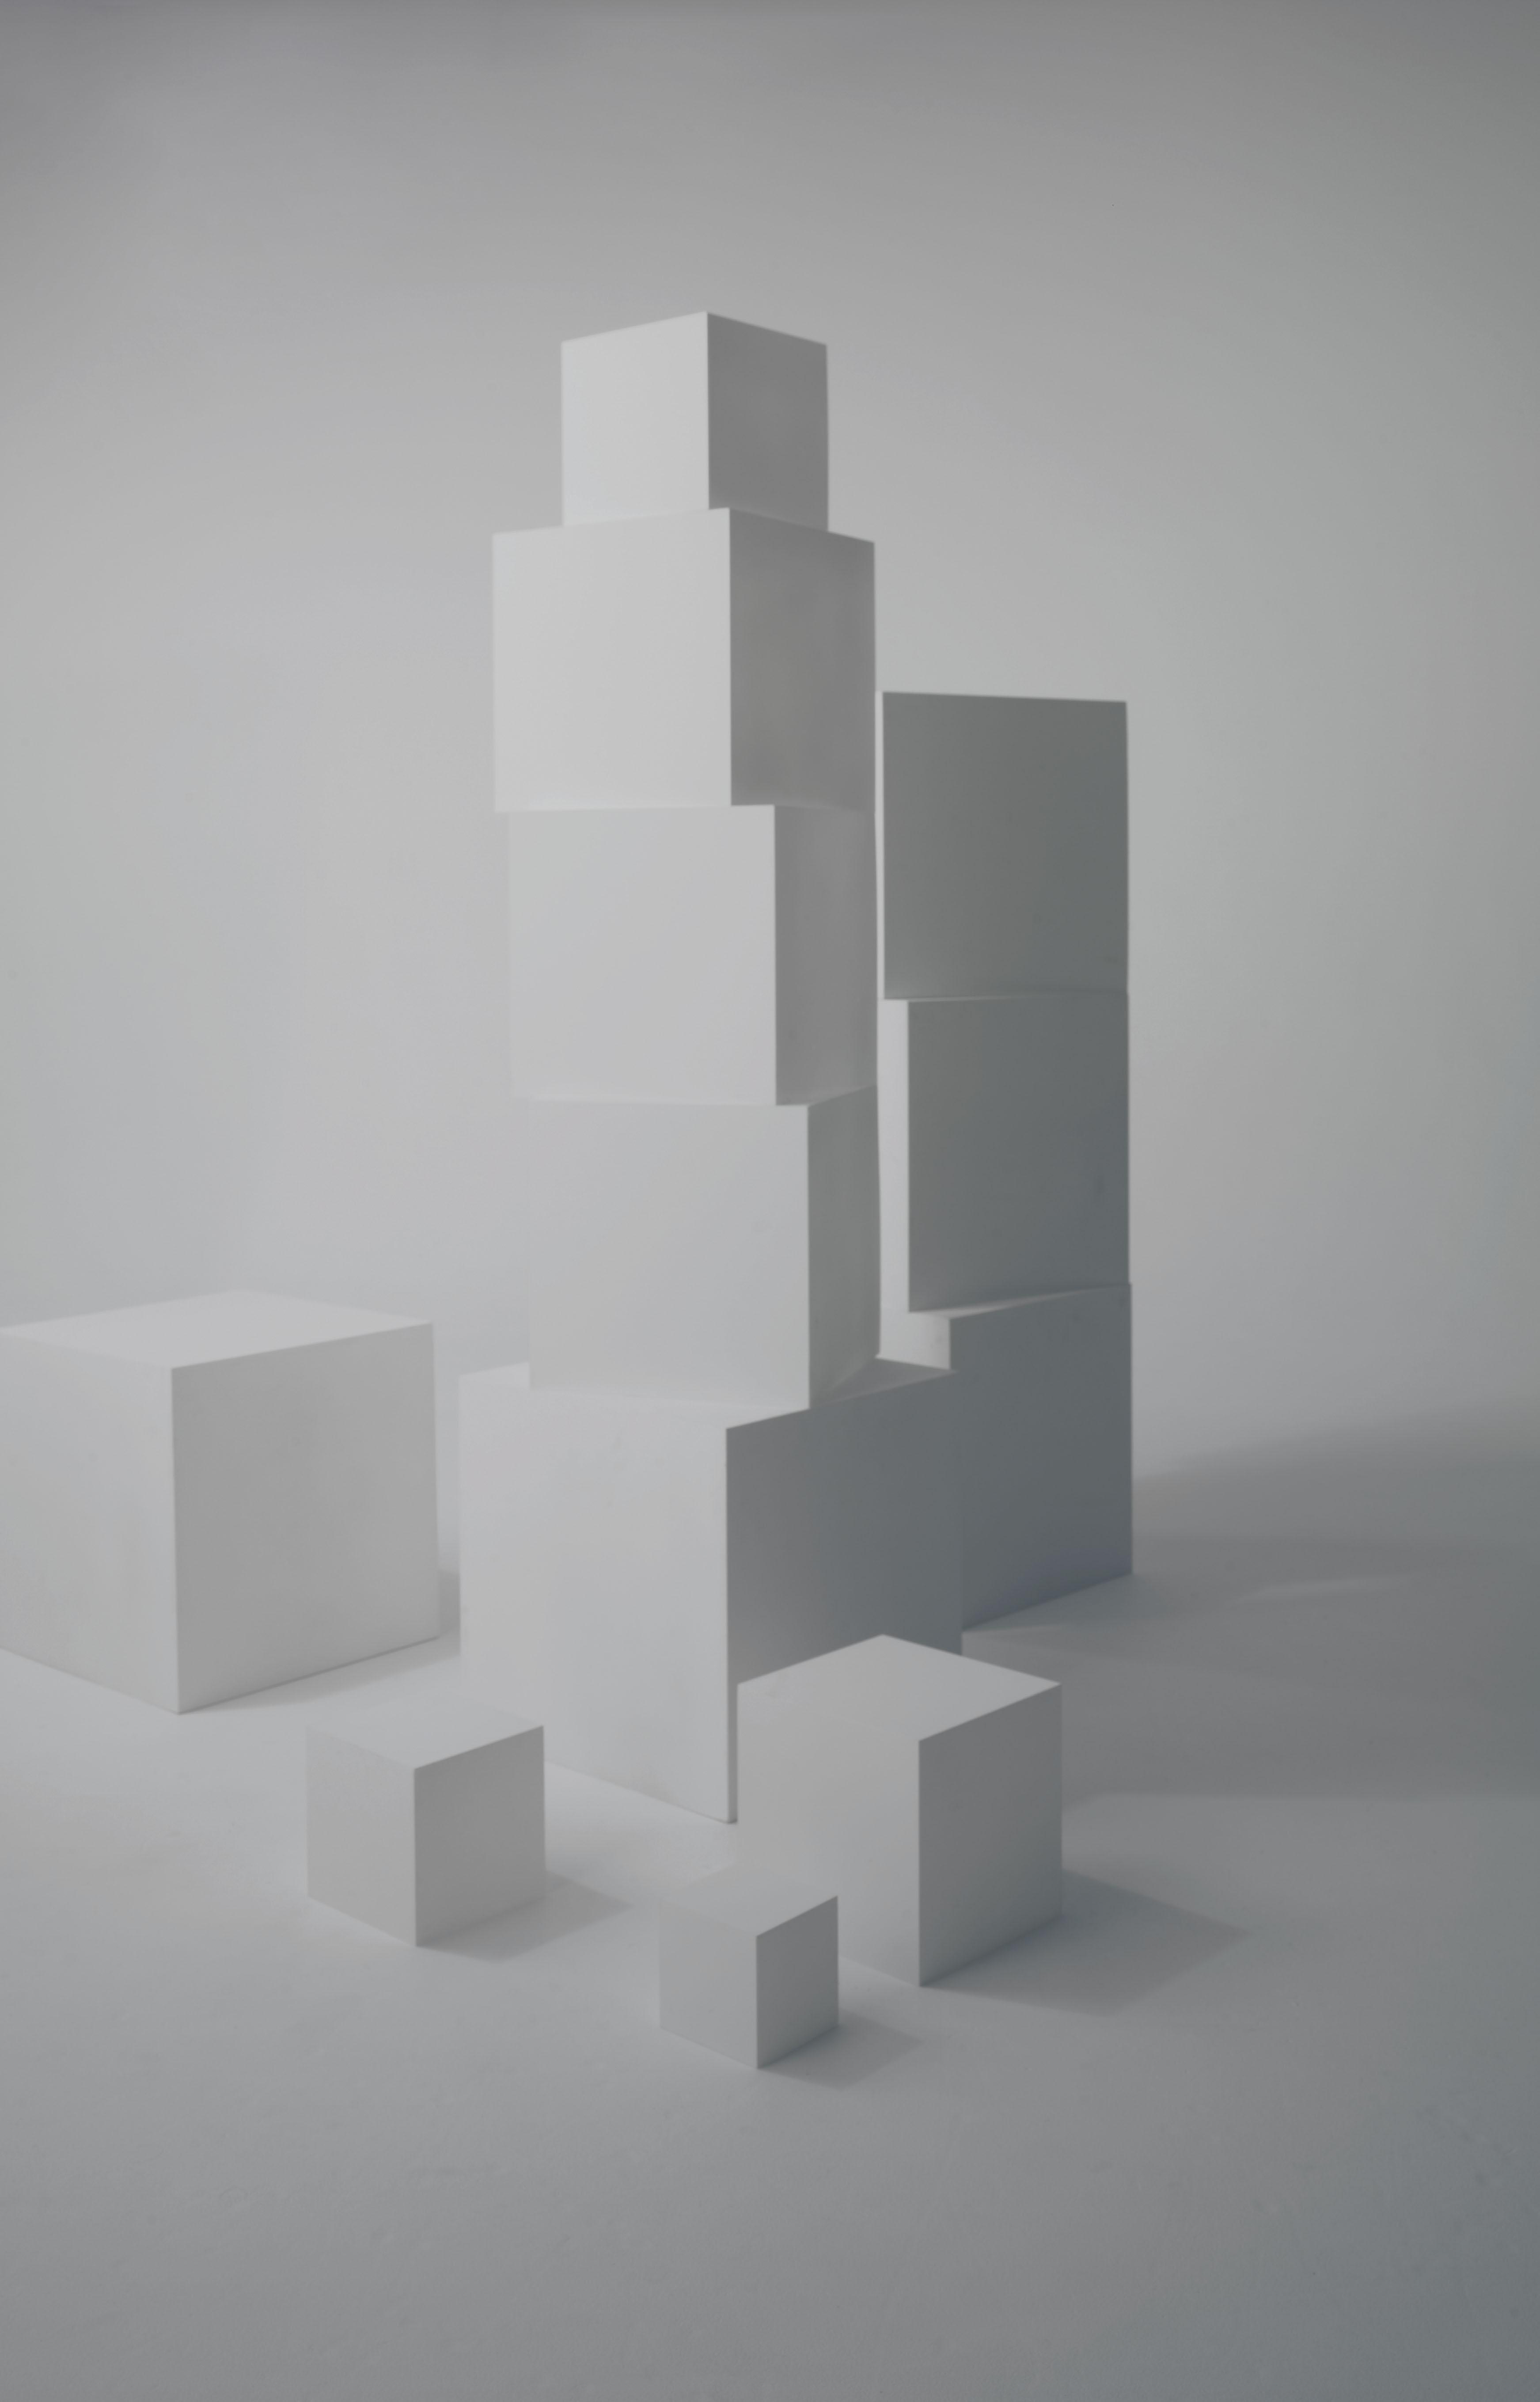 comp-0005_2